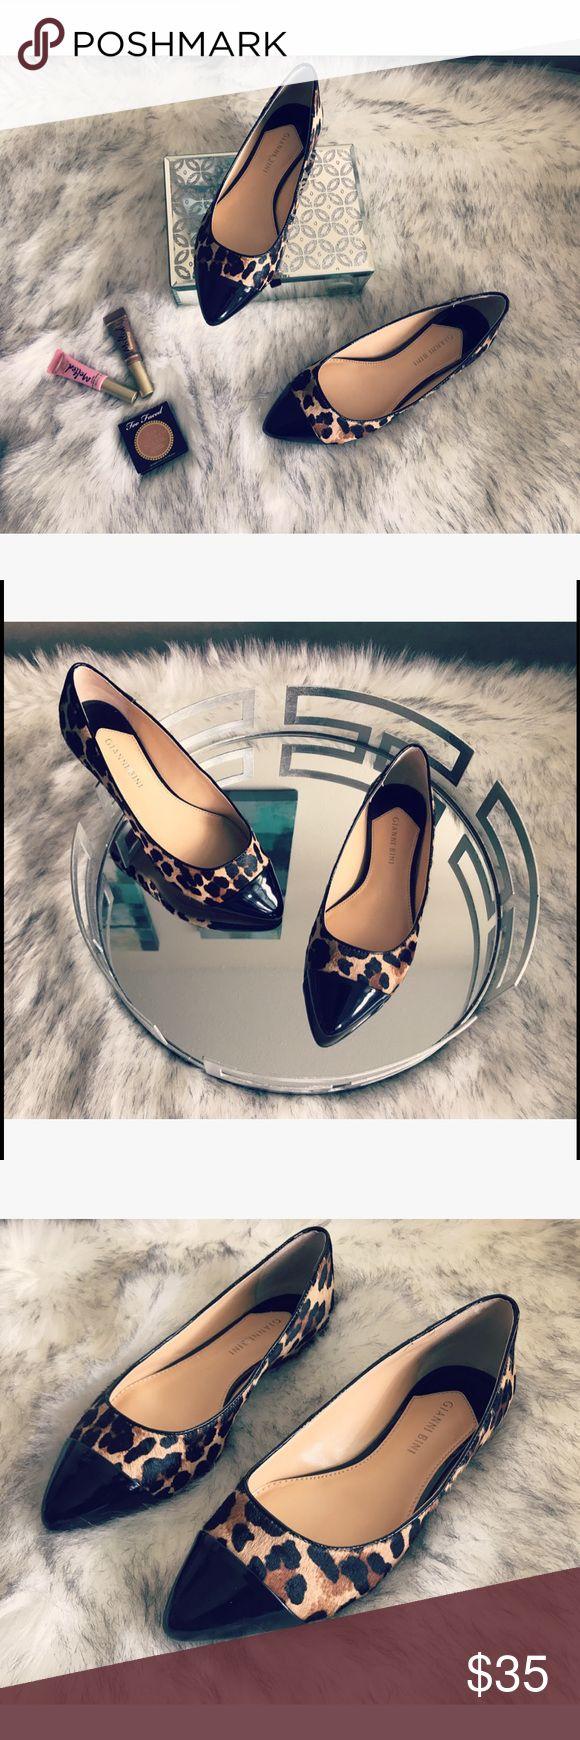 🎈SALE 🎈🎀 Gianni Bini flats 🎀 💝 Gorgeous Gianni Bini flats in leopard print size 7.5 barely worn 💝 Gianni Bini Shoes Flats & Loafers